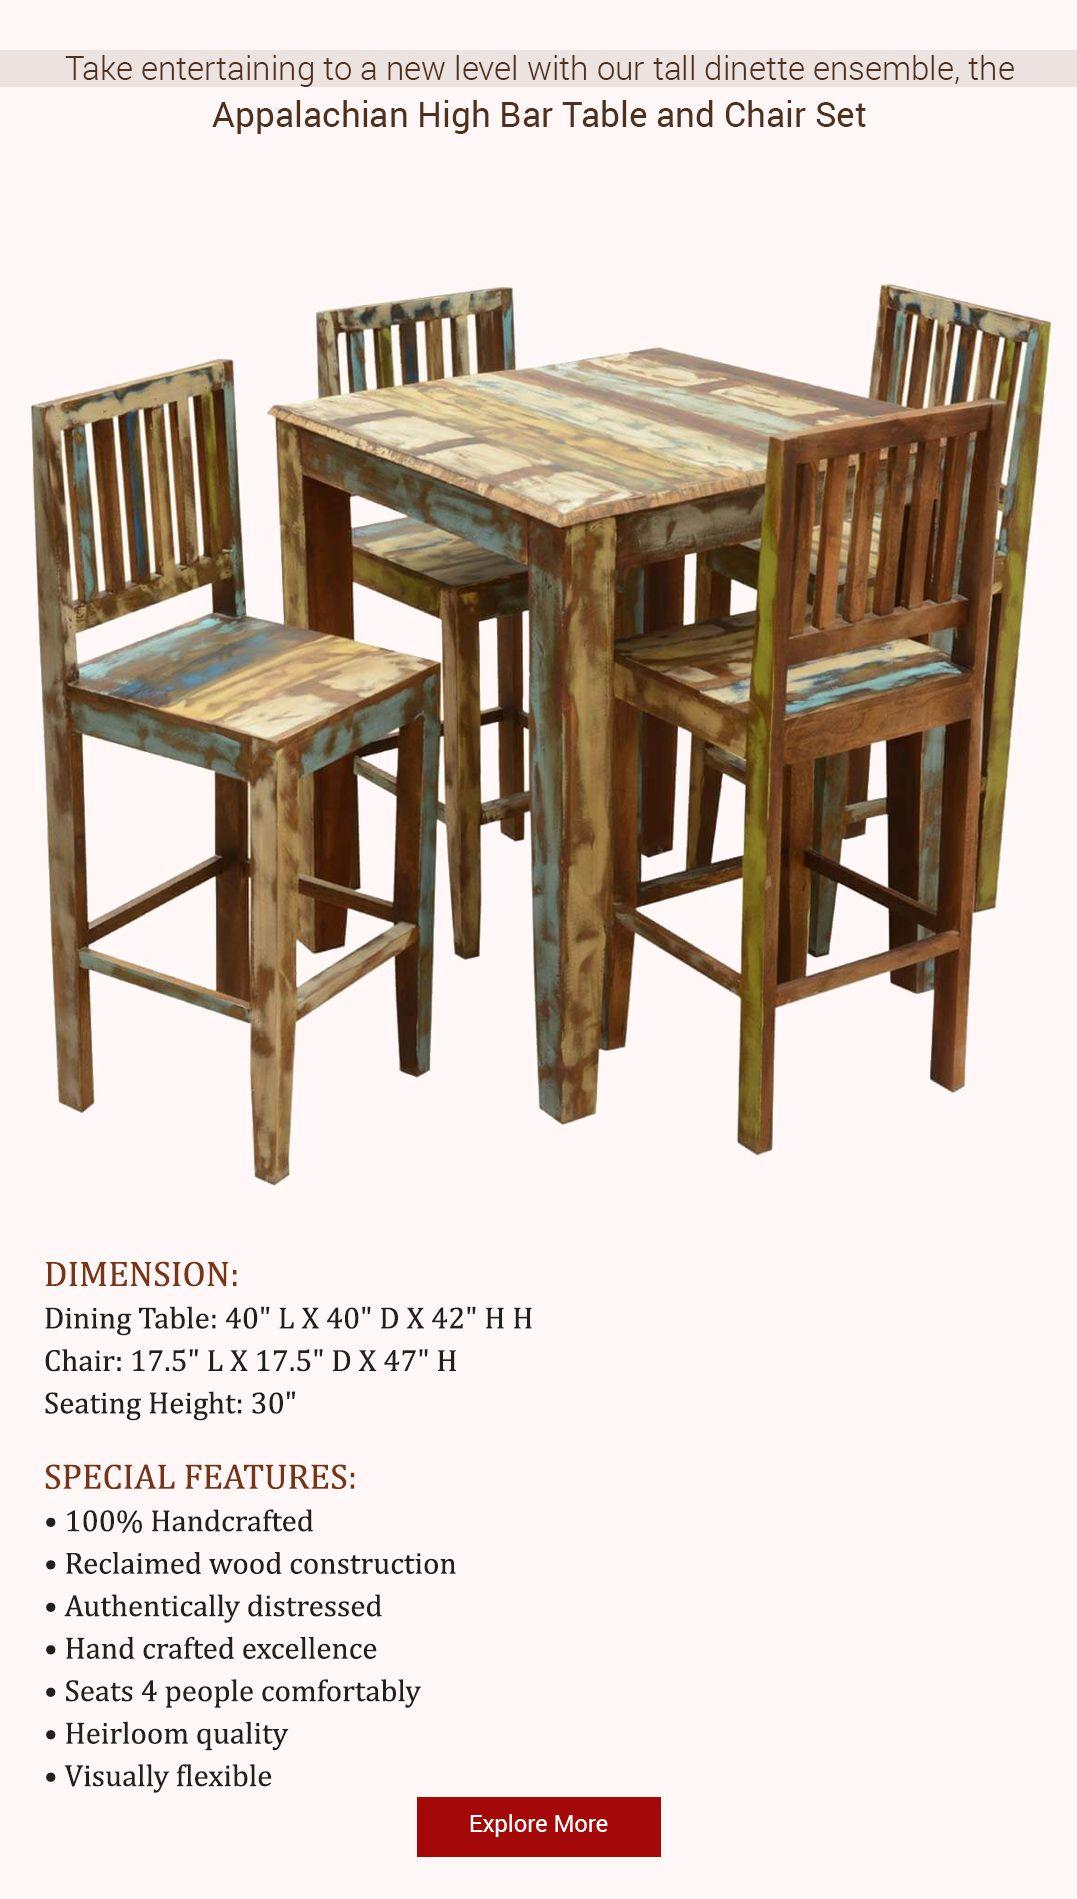 Appalachian Rustic Reclaimed Wood High Bar Table Chair Set Bar Table High Bar Table Rustic Solid Wood Dining Table Rustic high top table and chairs